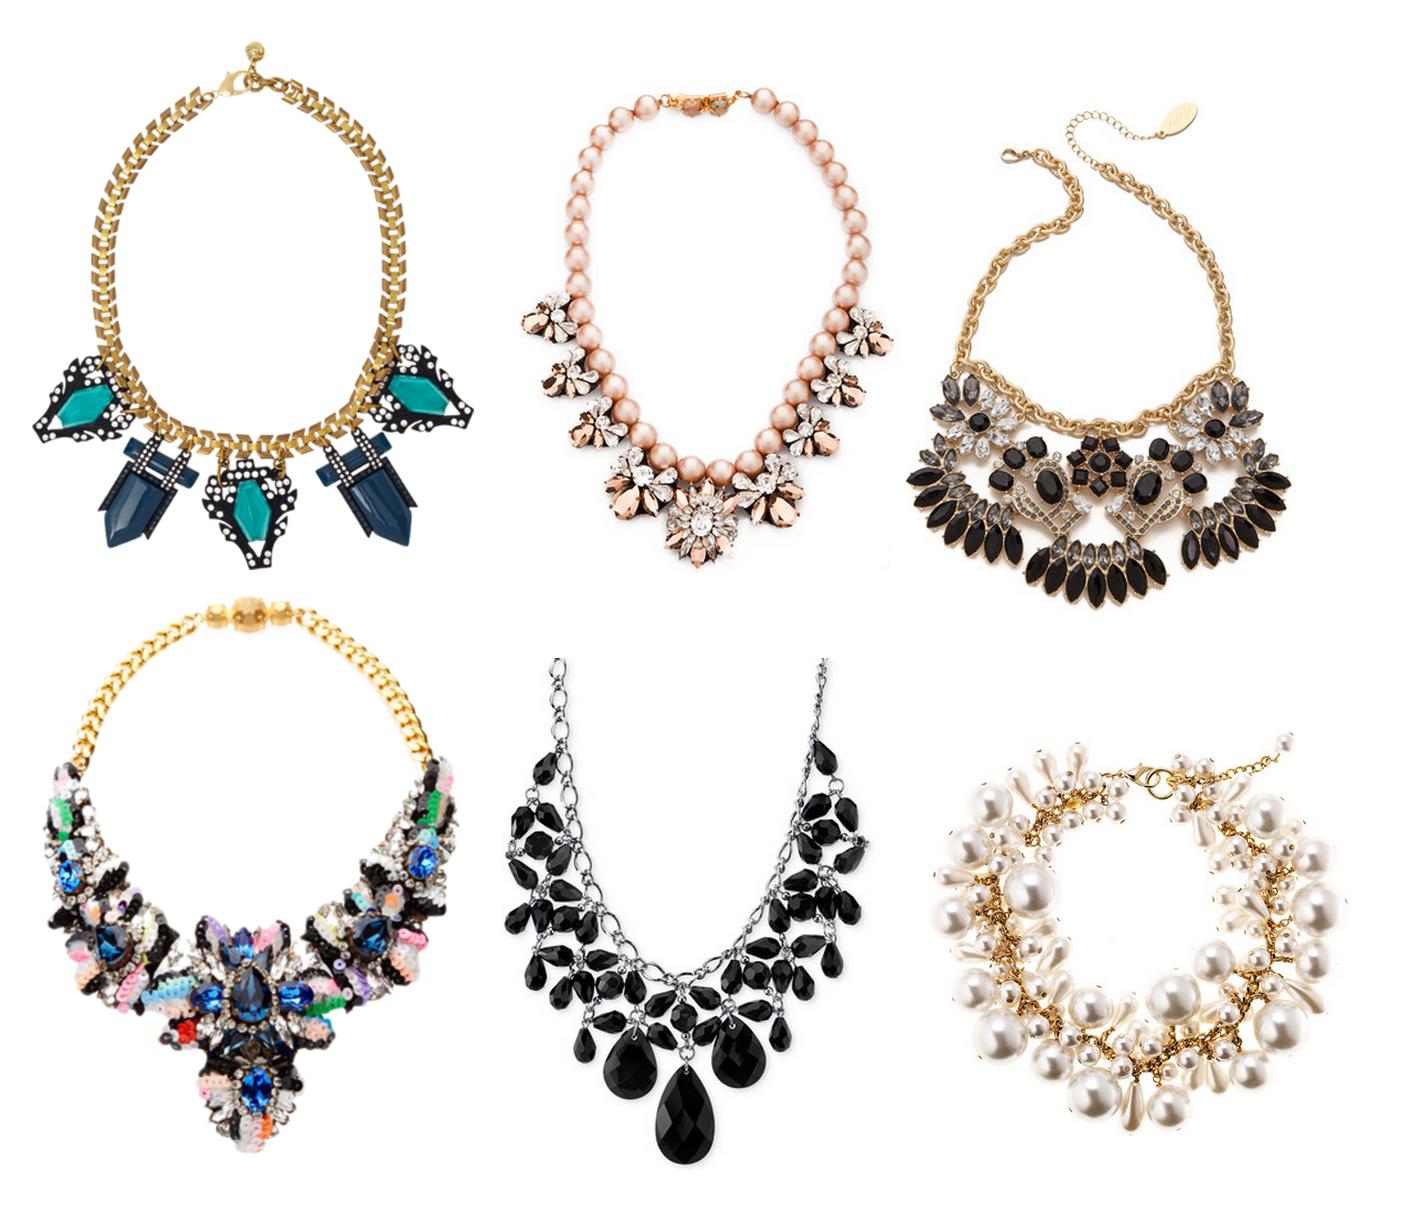 Statement Jewelry to Make You Shine at New Year's Eve – Fashion Style Magazine